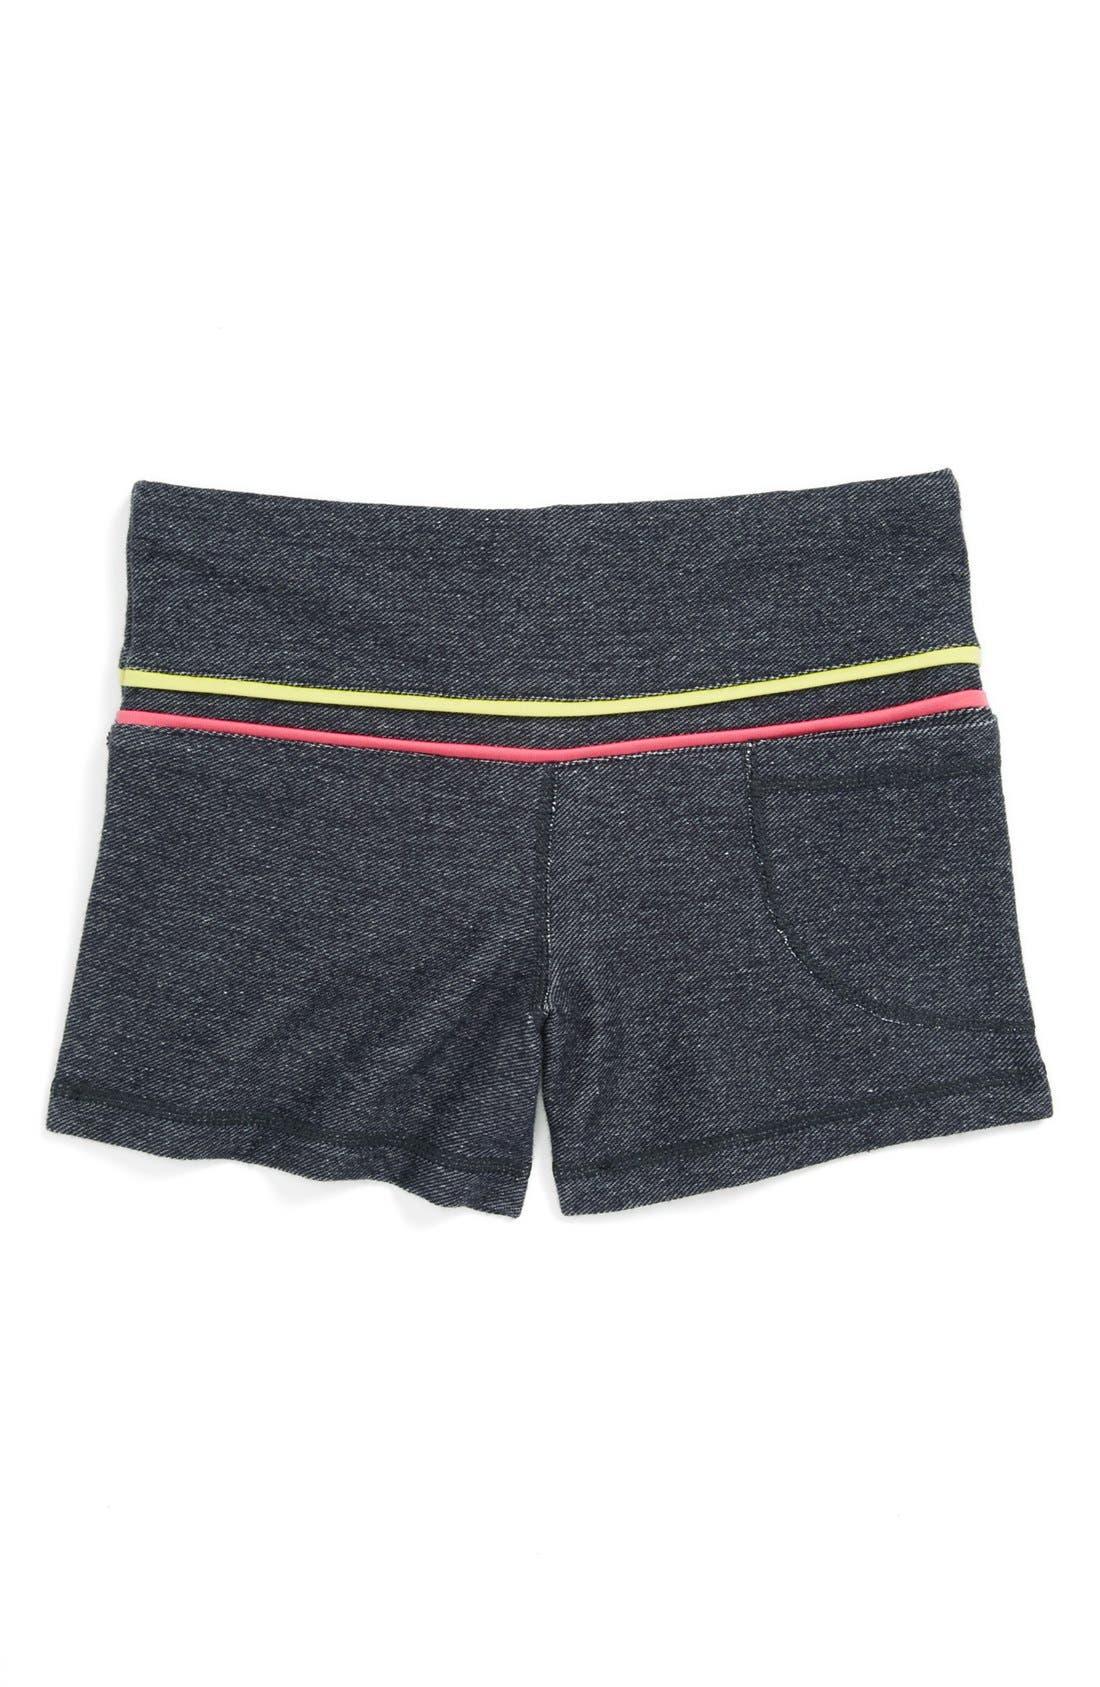 Alternate Image 2  - Limeapple 'Dance' Shorts (Big Girls)